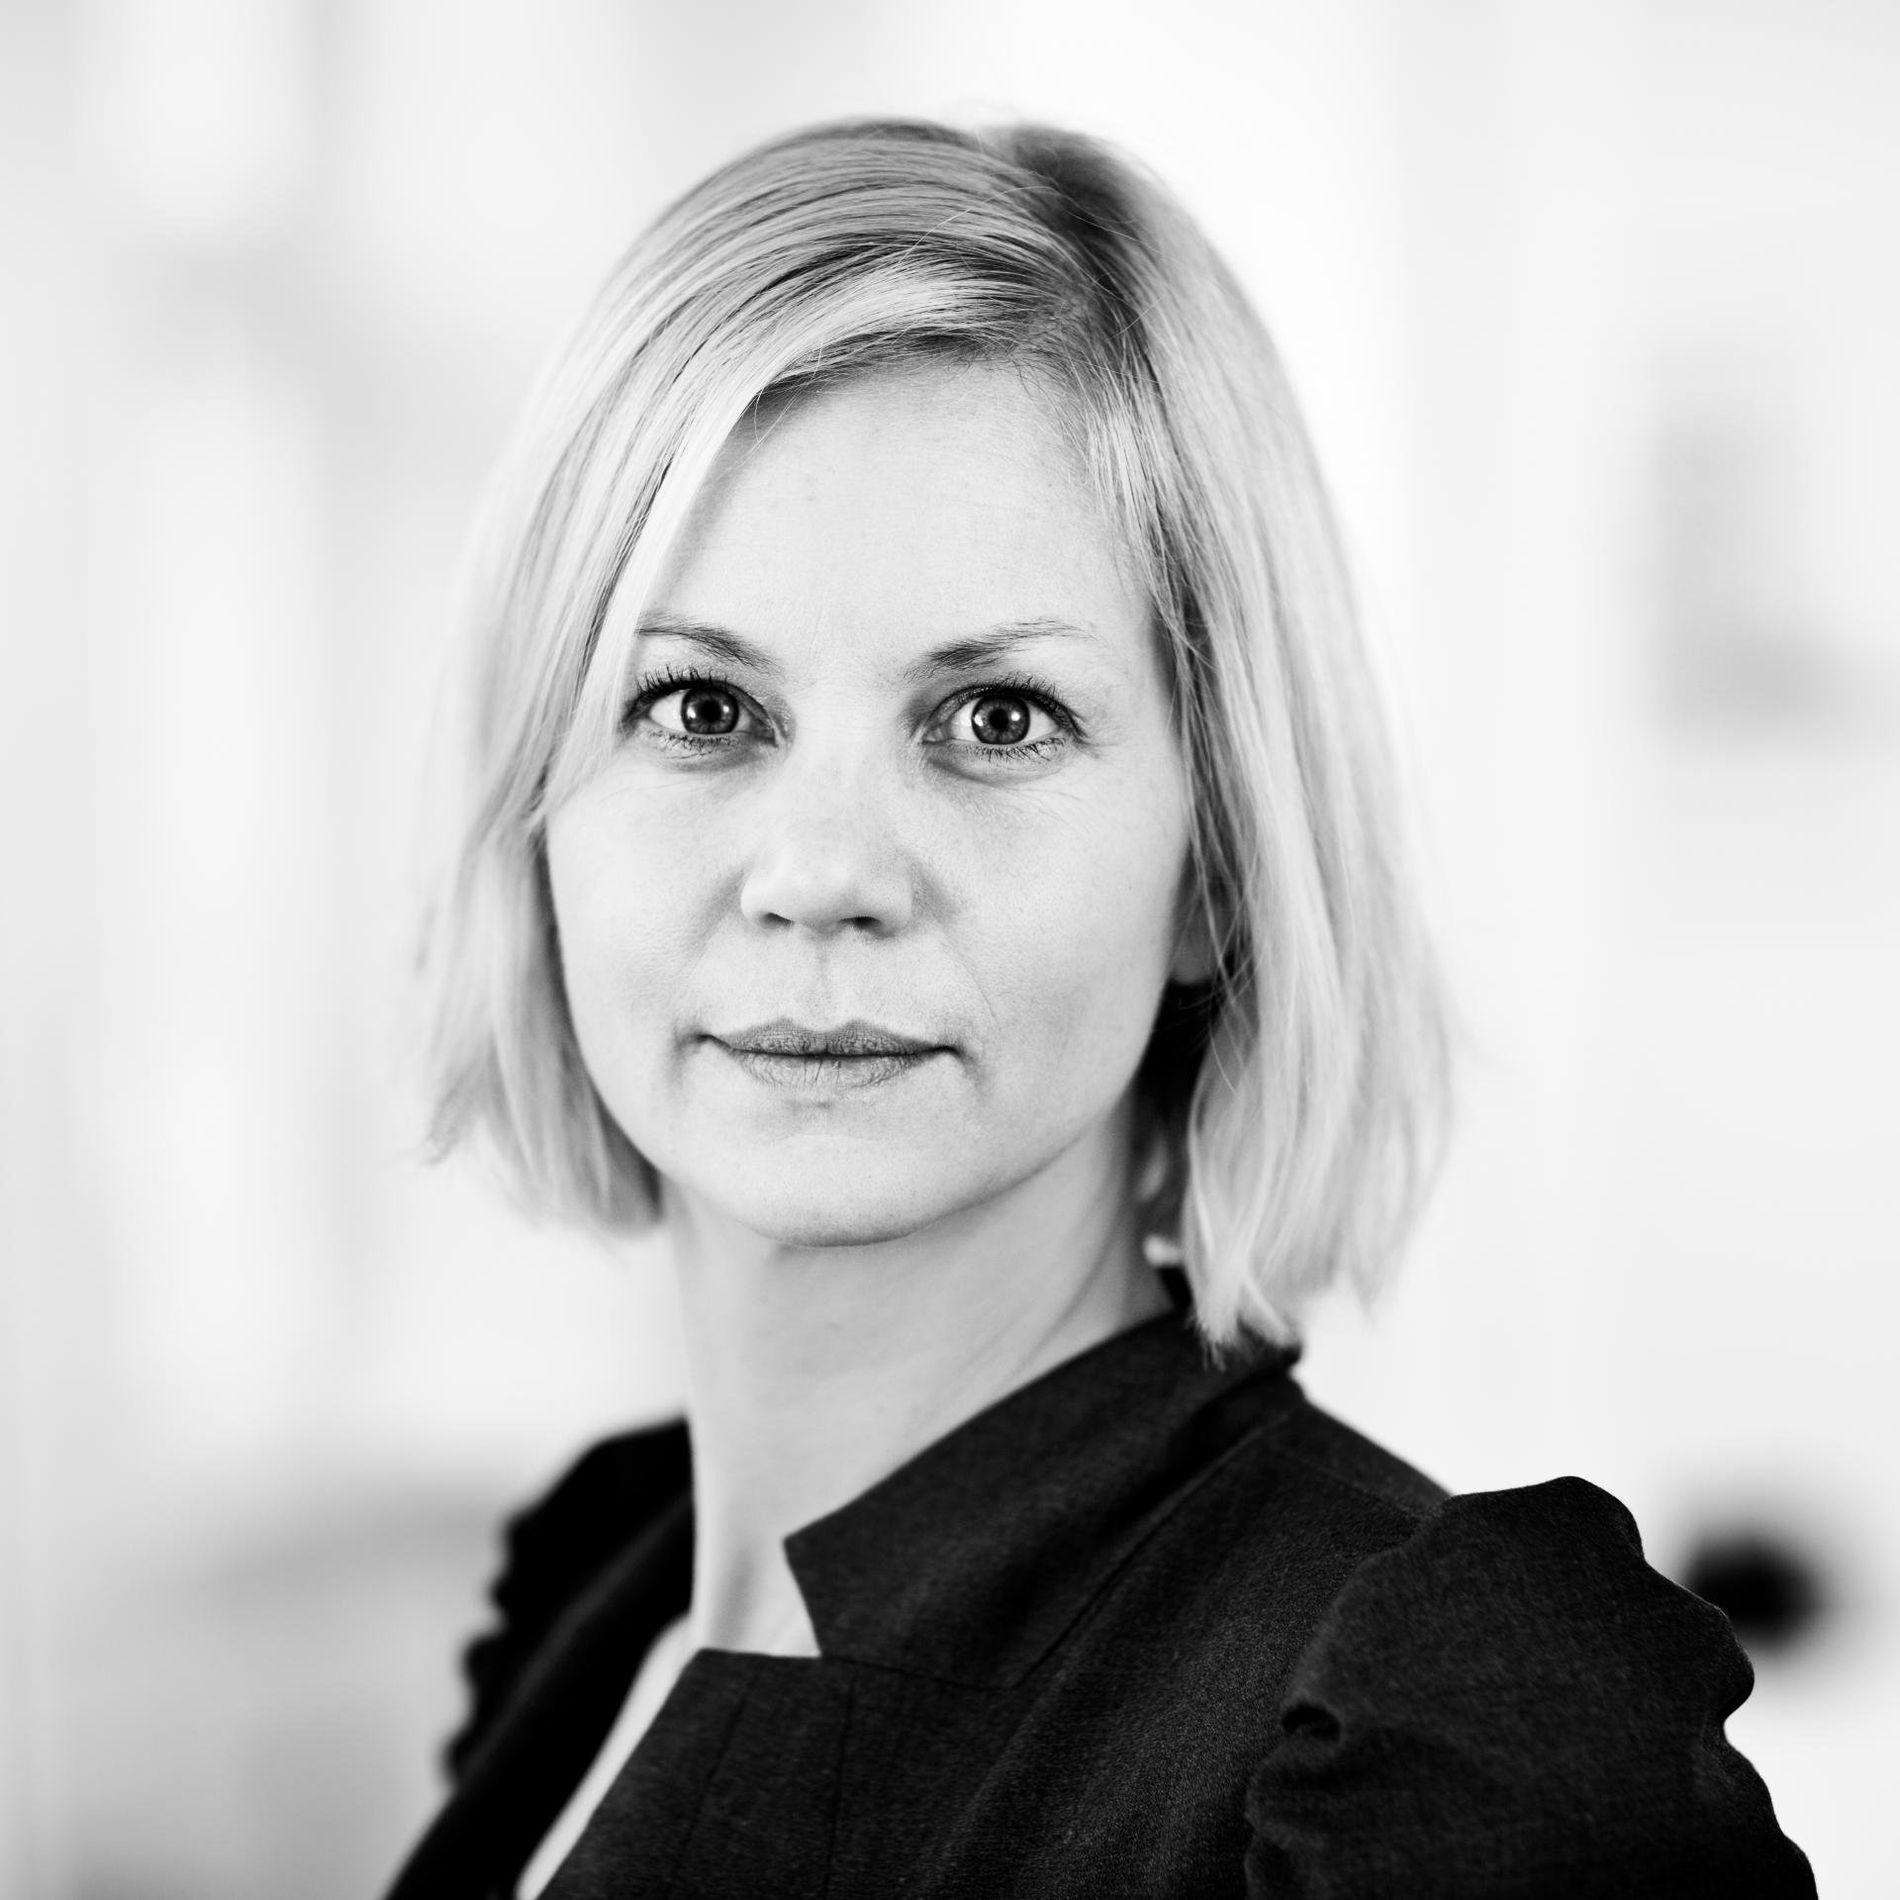 ARV OG MILJØ: Foreldre betyr mye, men langt ifra alt. Ingen familie er en ensom øy, skriver Sigrun Gjerløw Aasland.